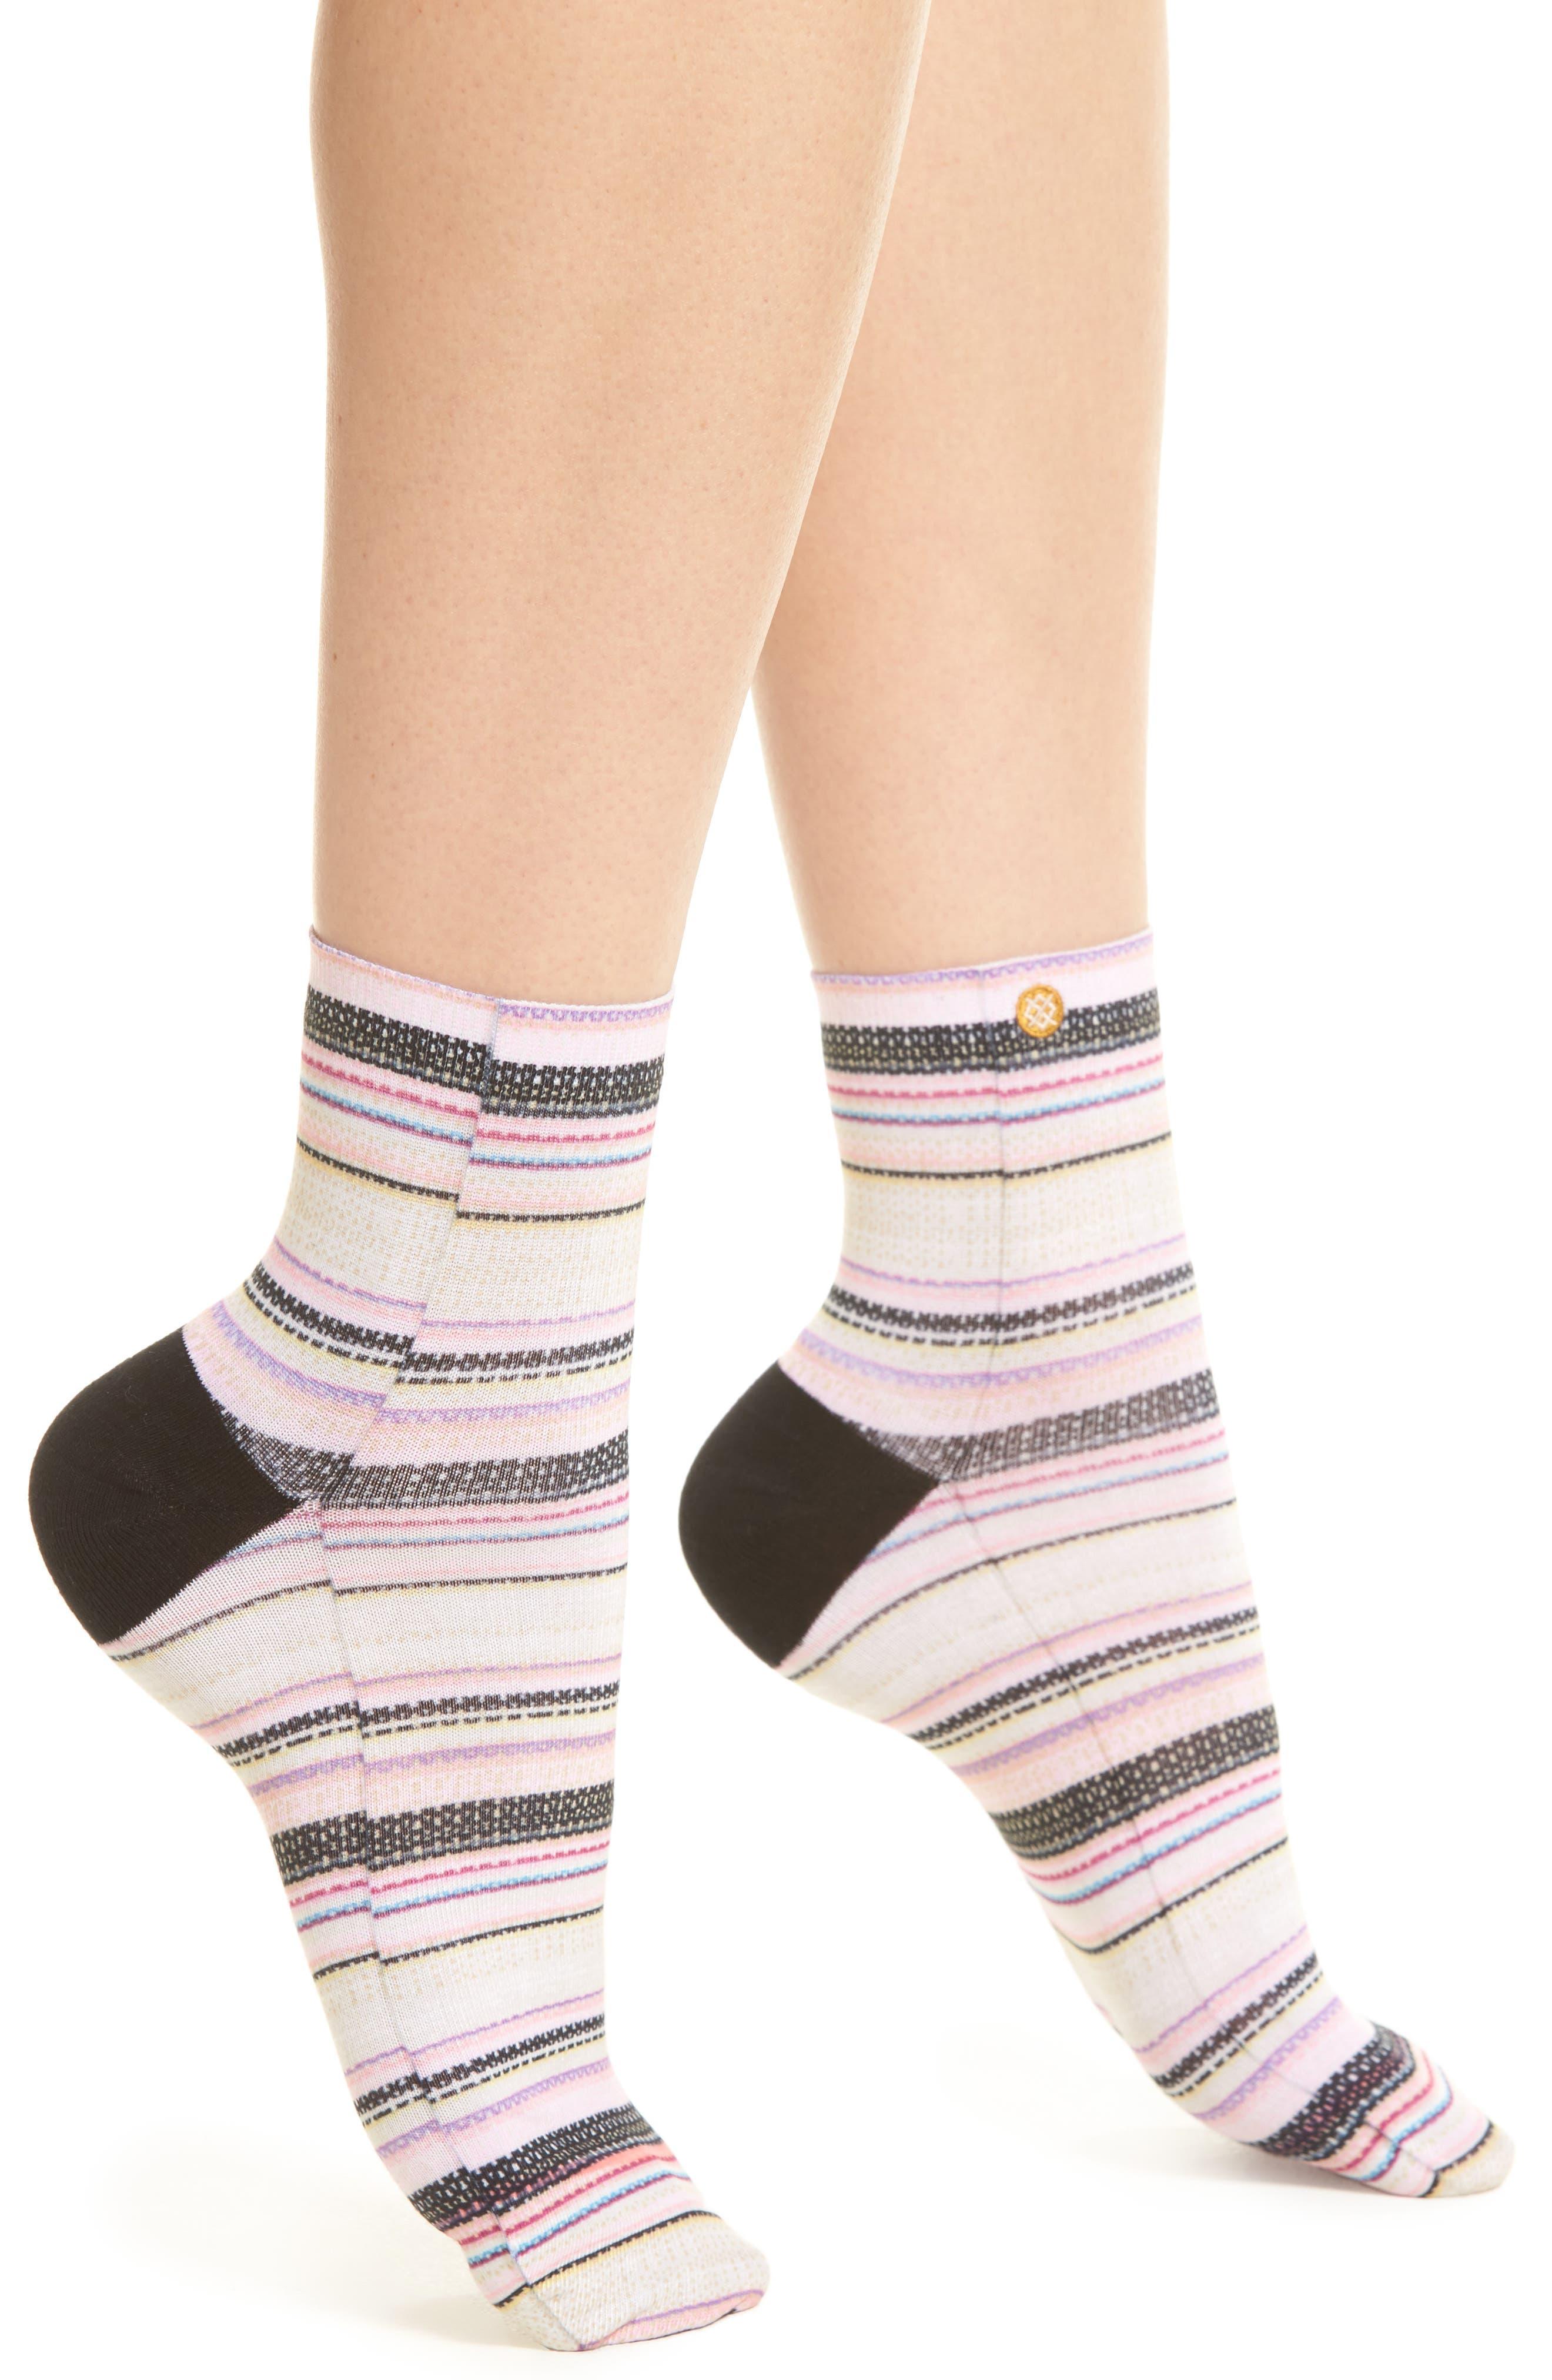 Bahama Mama Ankle Socks,                             Main thumbnail 1, color,                             Multi